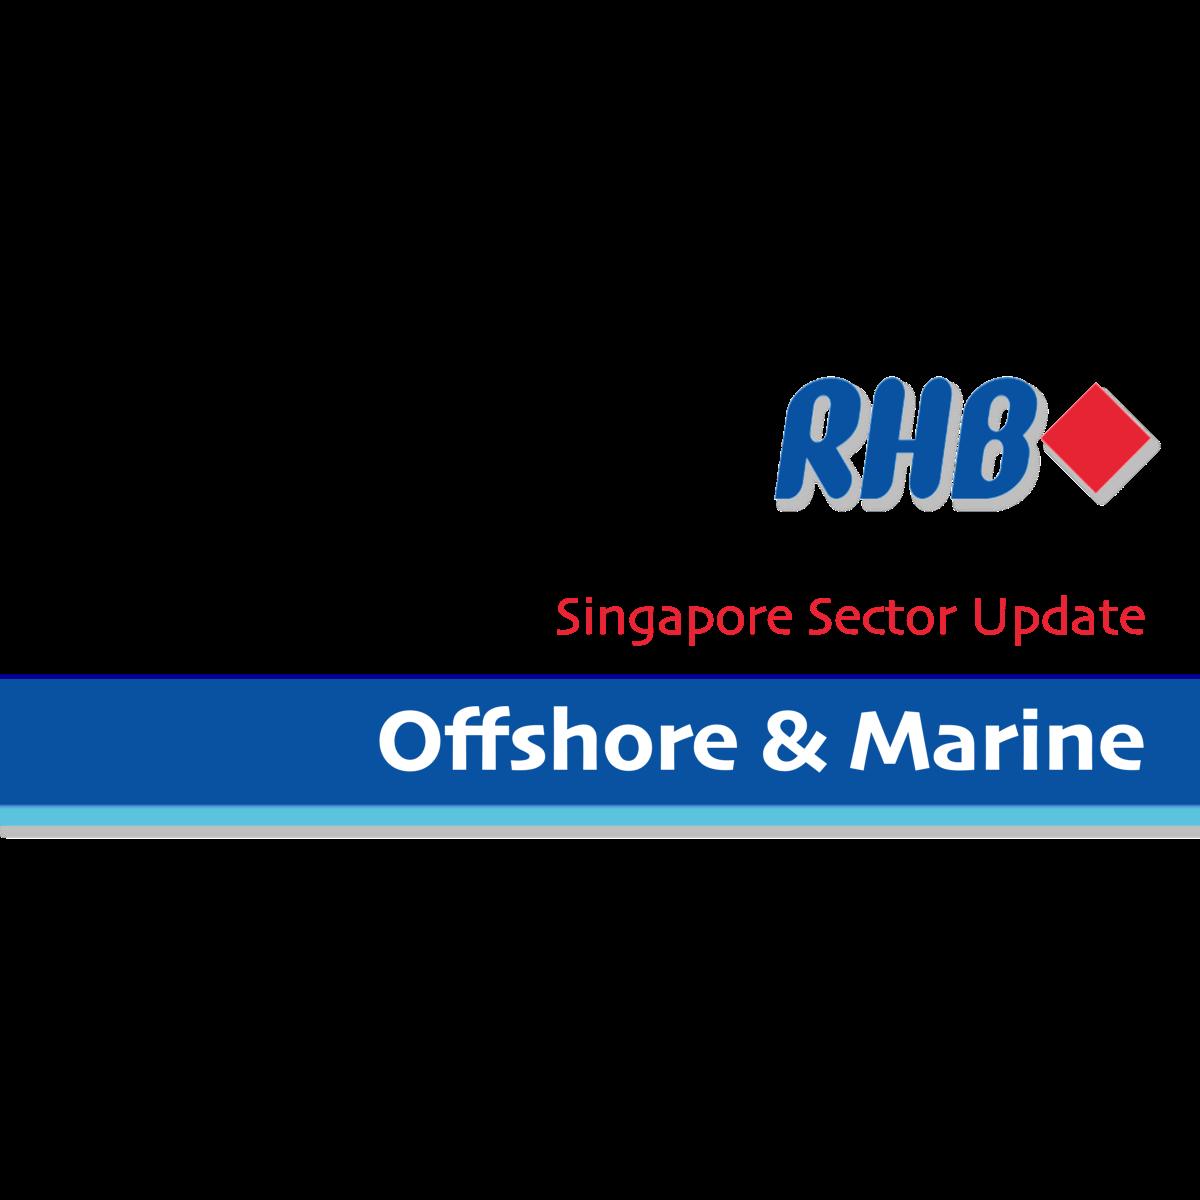 Offshore & Marine - RHB Research | SGinvestors.io